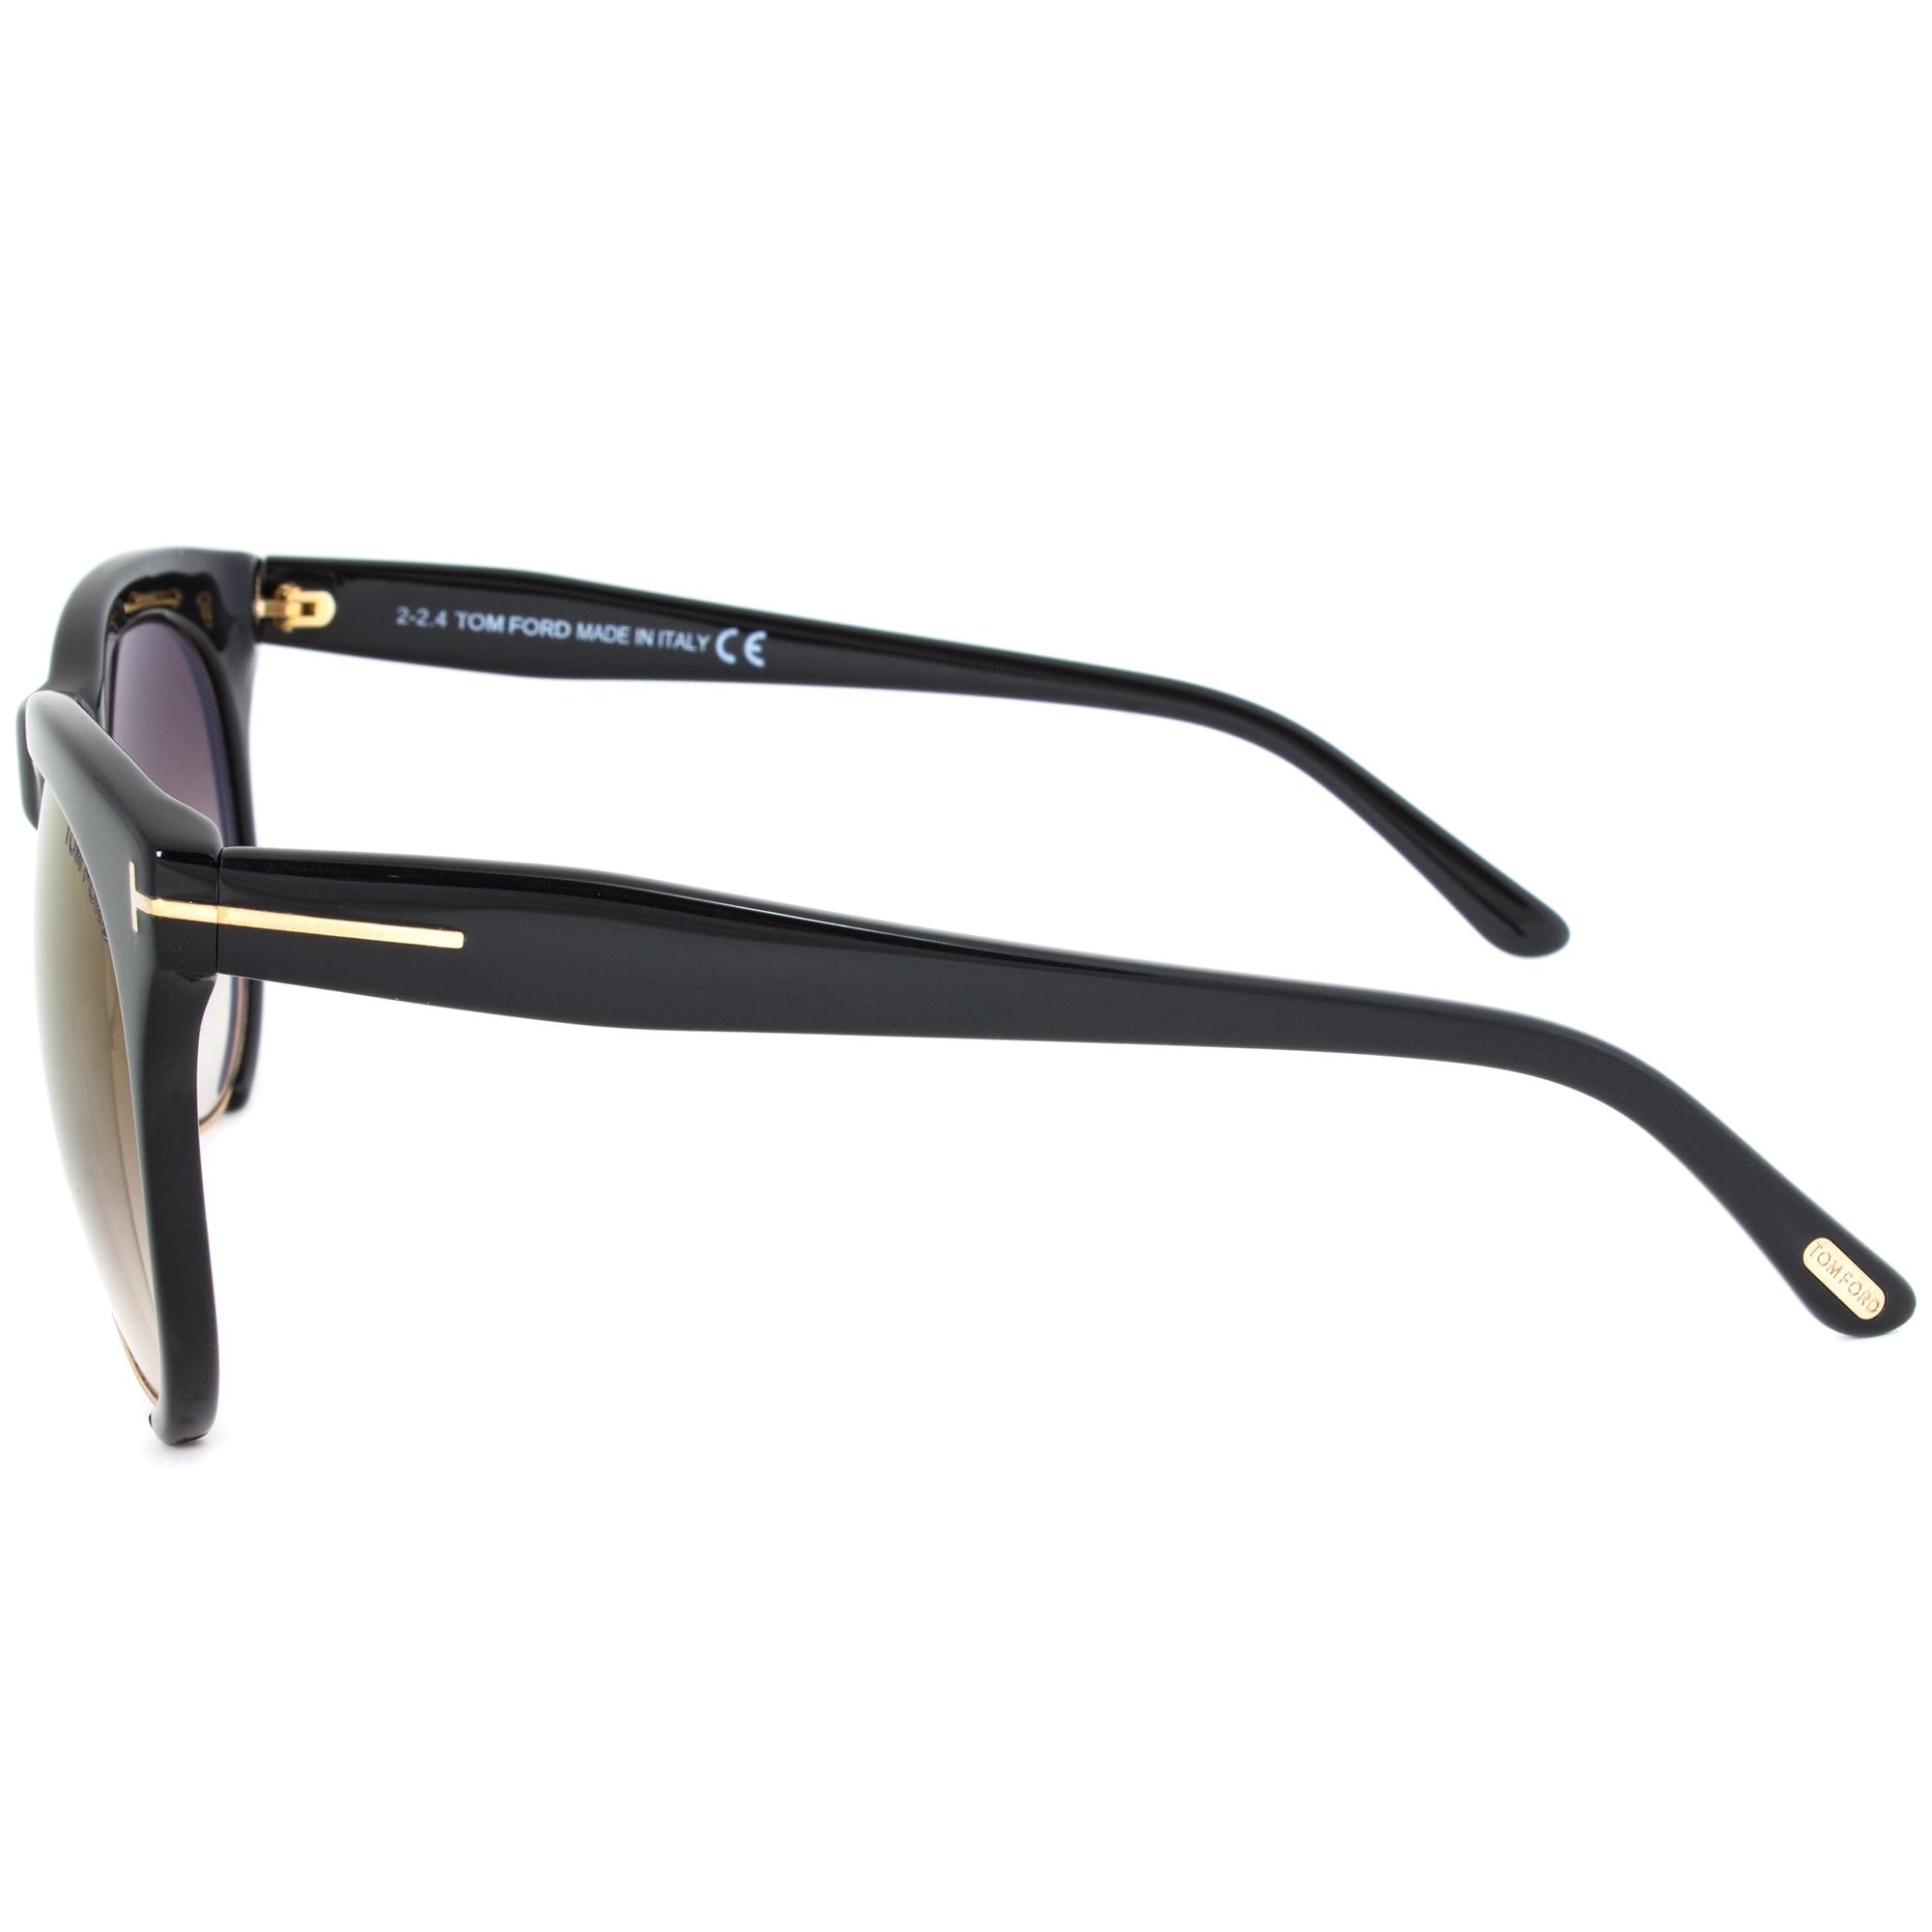 986cc6708b6 Shop Tom Ford Leona Sunglasses FT0365 01G